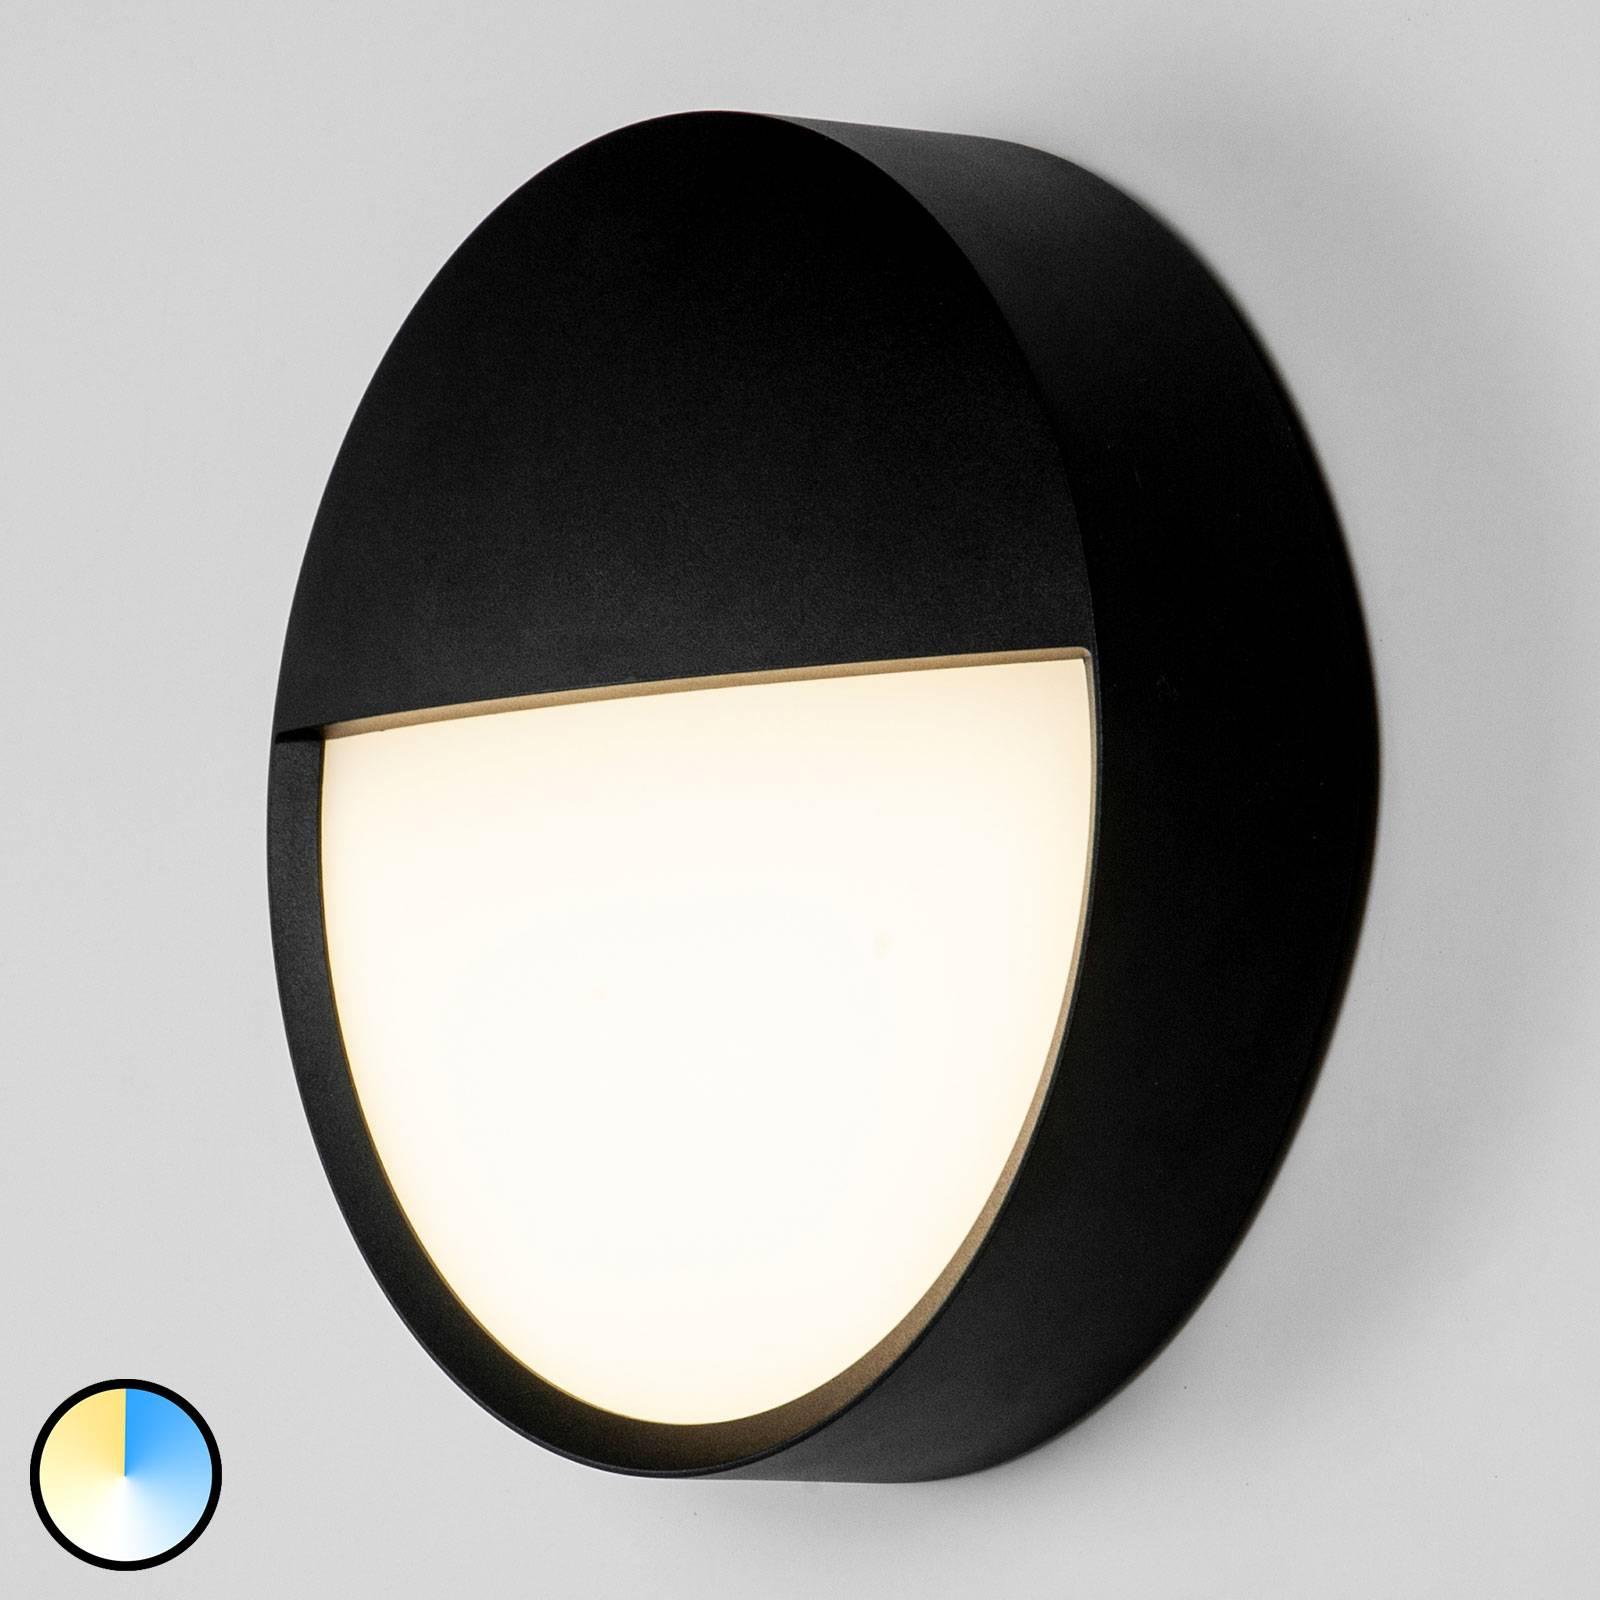 BRUMBERG Eye LED-Außenwandleuchte halb geschlossen